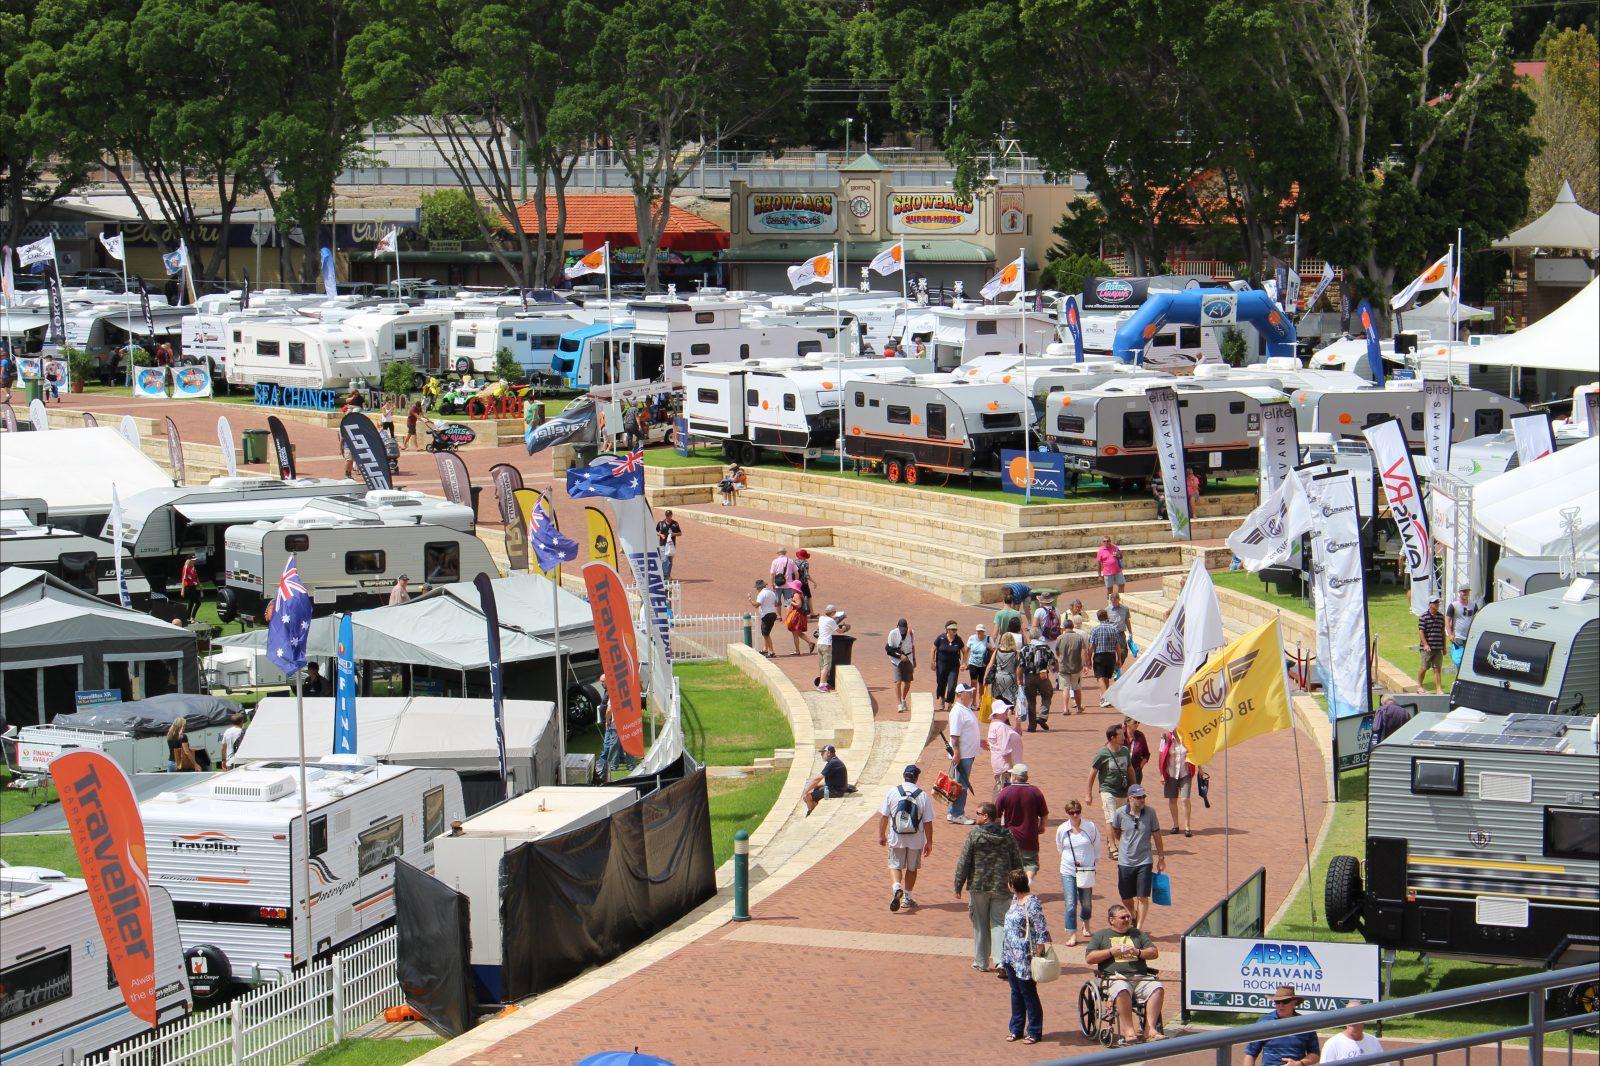 Perth Caravan and Camping Show, Perth, Western Australia